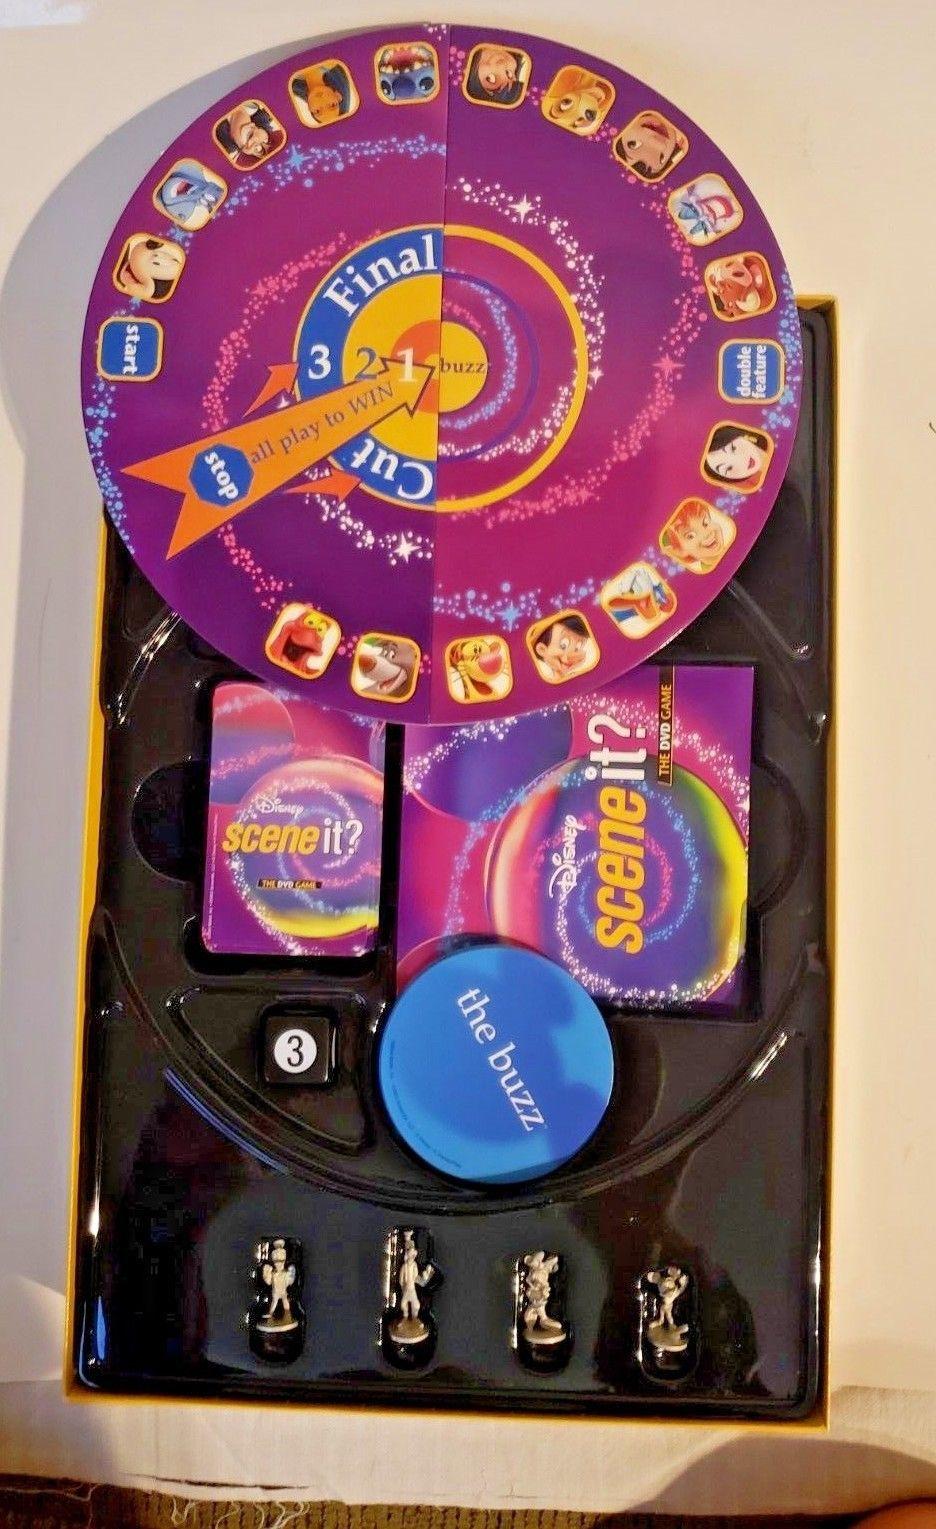 Disney Scene It! The DVD Game 1st Edition 2004 Mattel Pixar Characters!!!! image 4